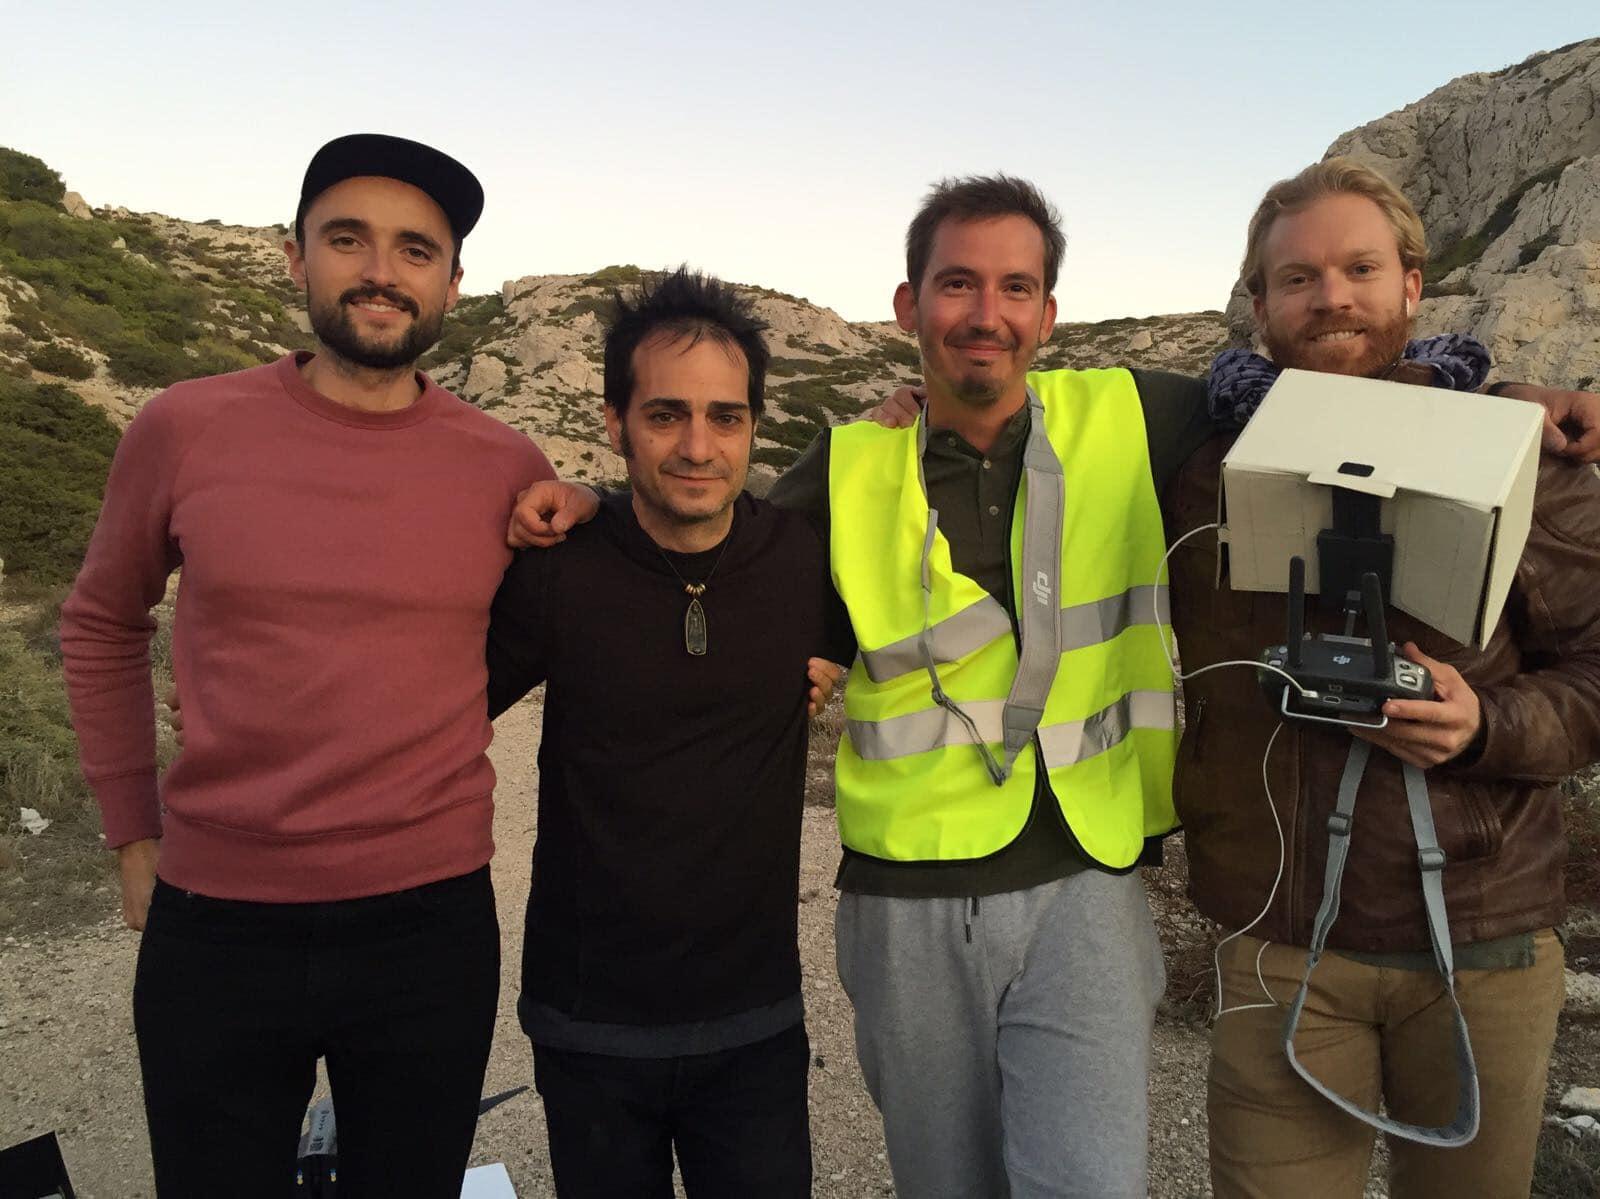 tournage drone marseille